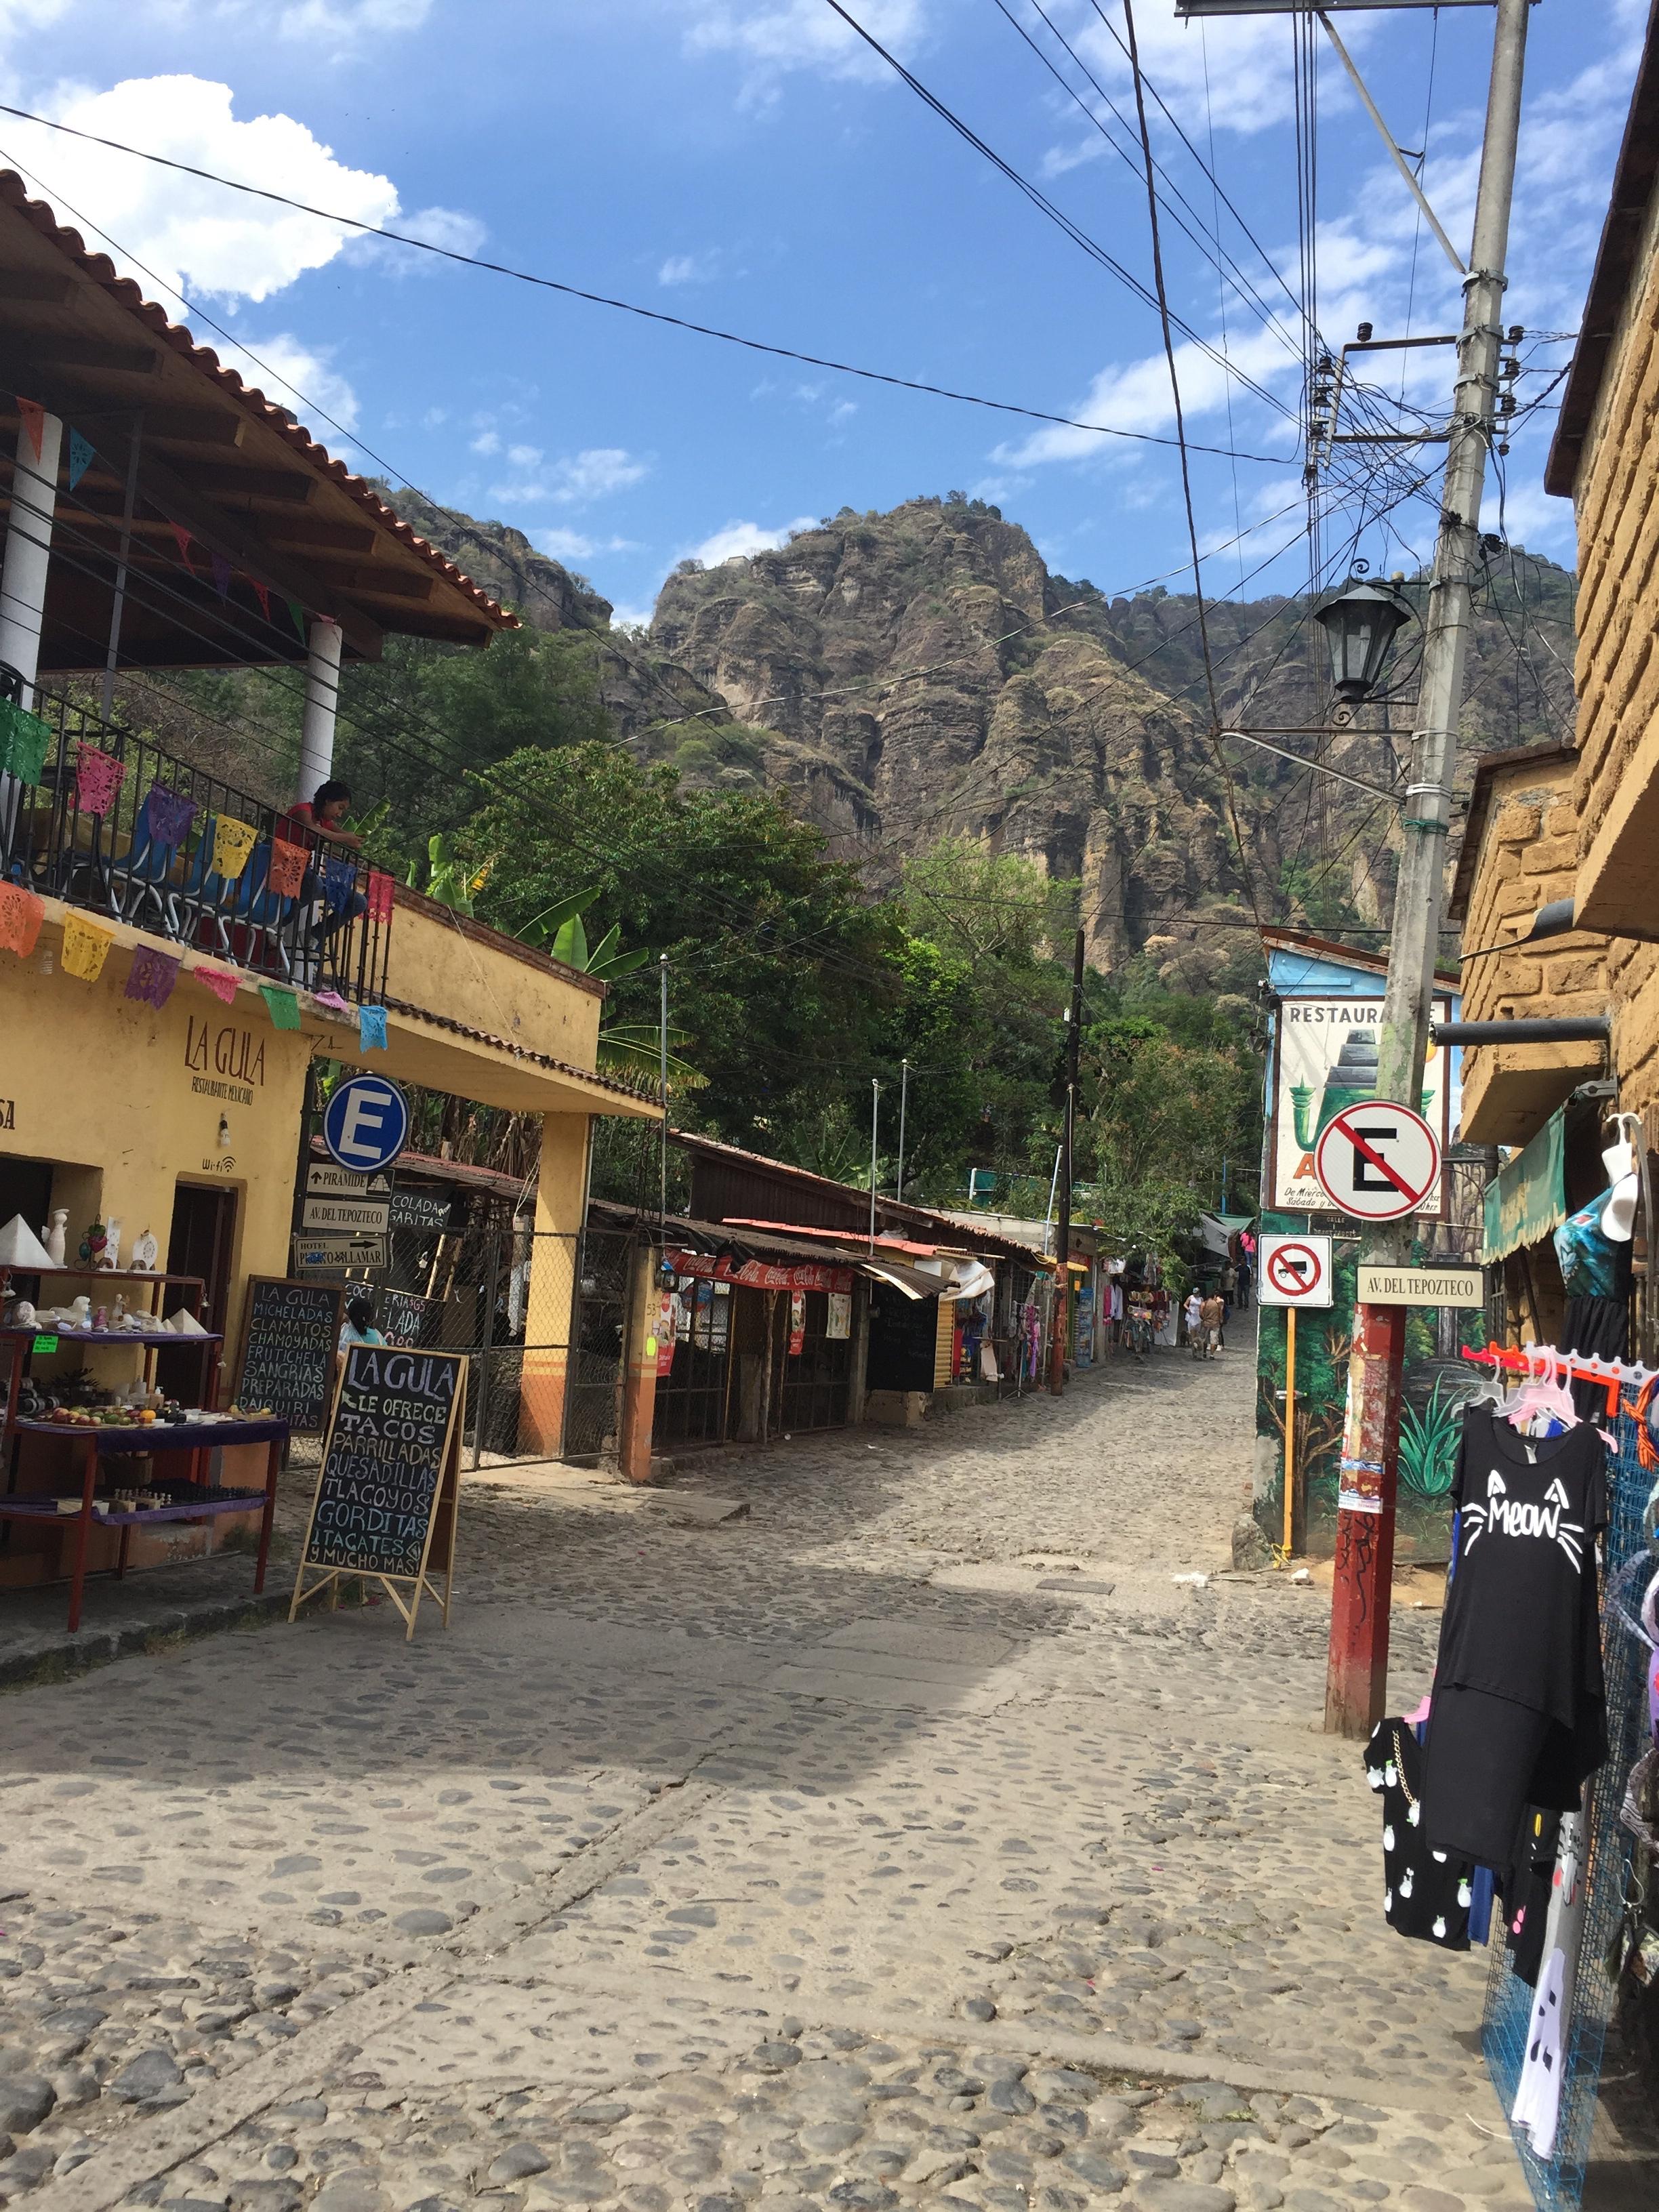 A cobblestone street in Tepoztlan, Mexico.